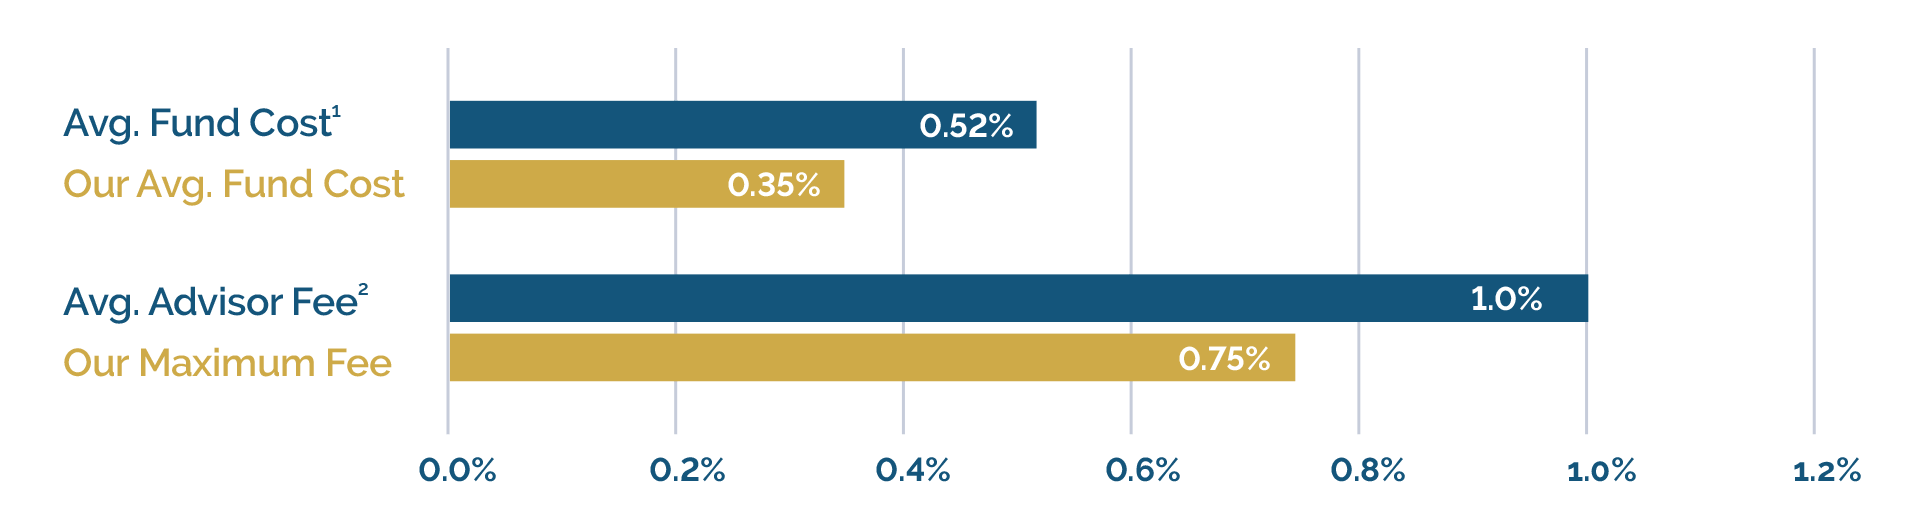 Sweeney & Michel Cost Comparison Chart and Maximum Fee